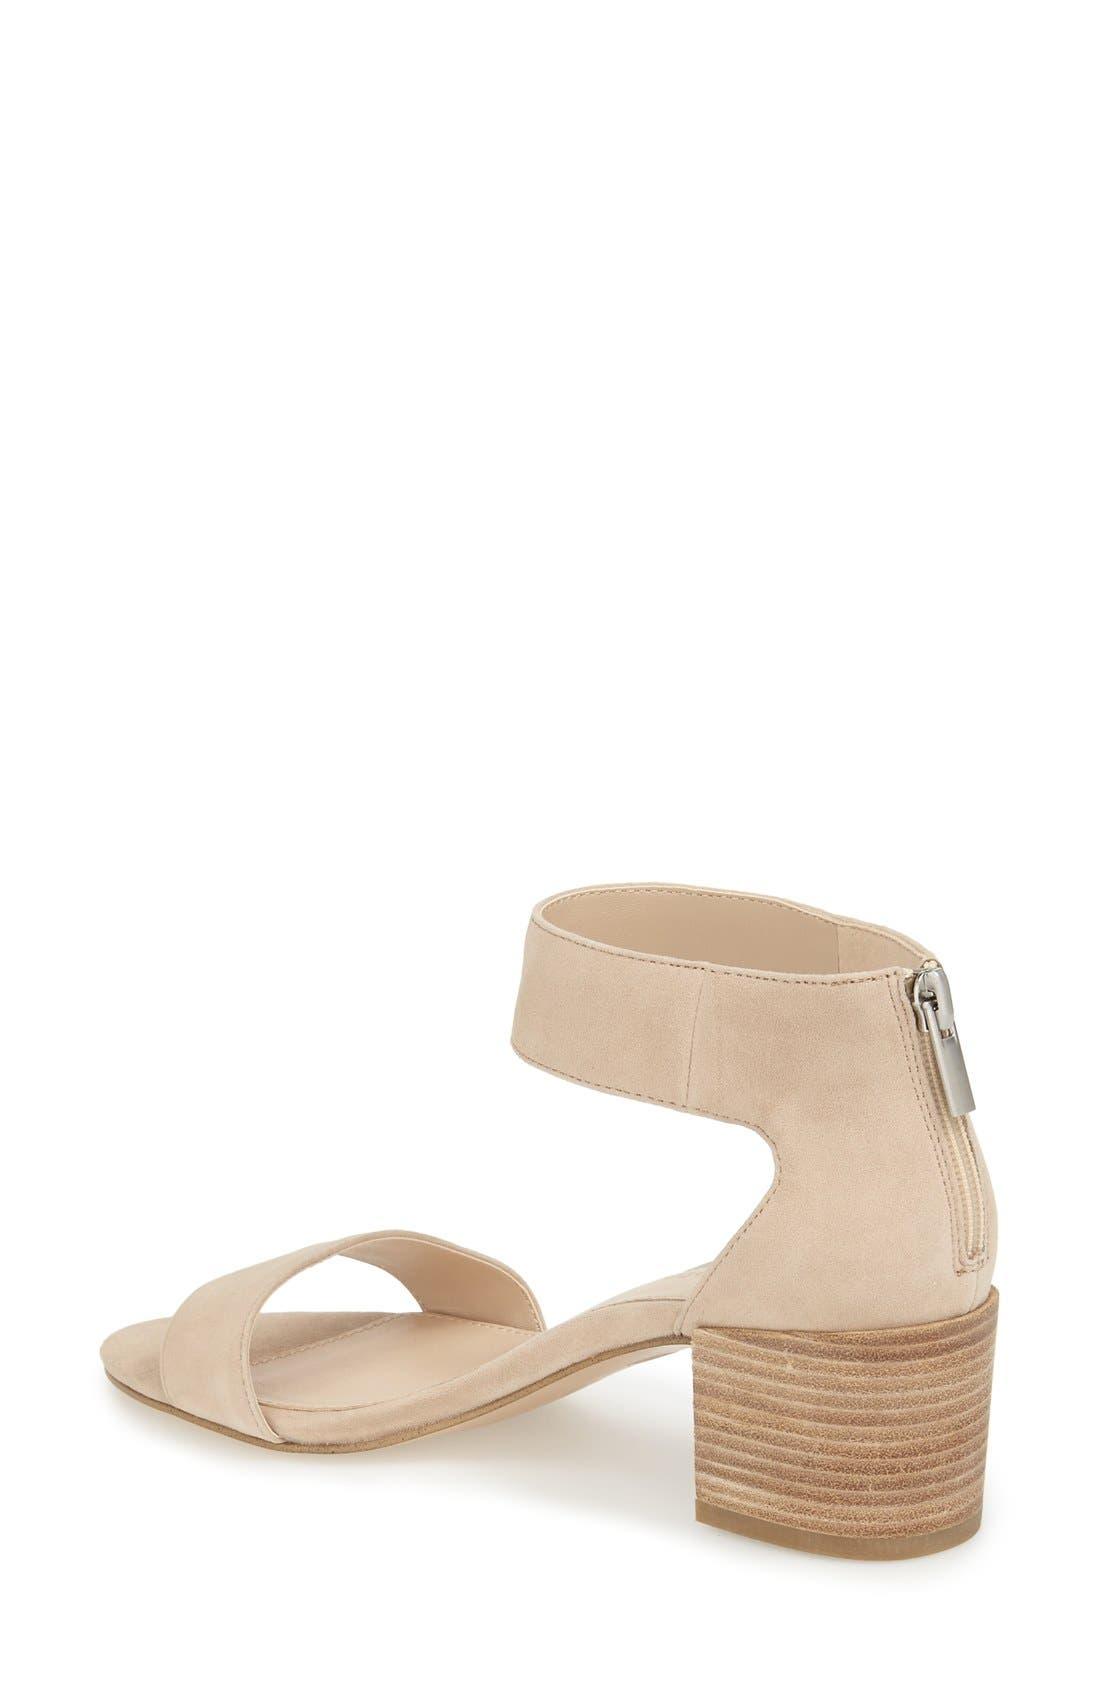 Pella Moda 'Urban' Block Heel Sandal,                             Alternate thumbnail 6, color,